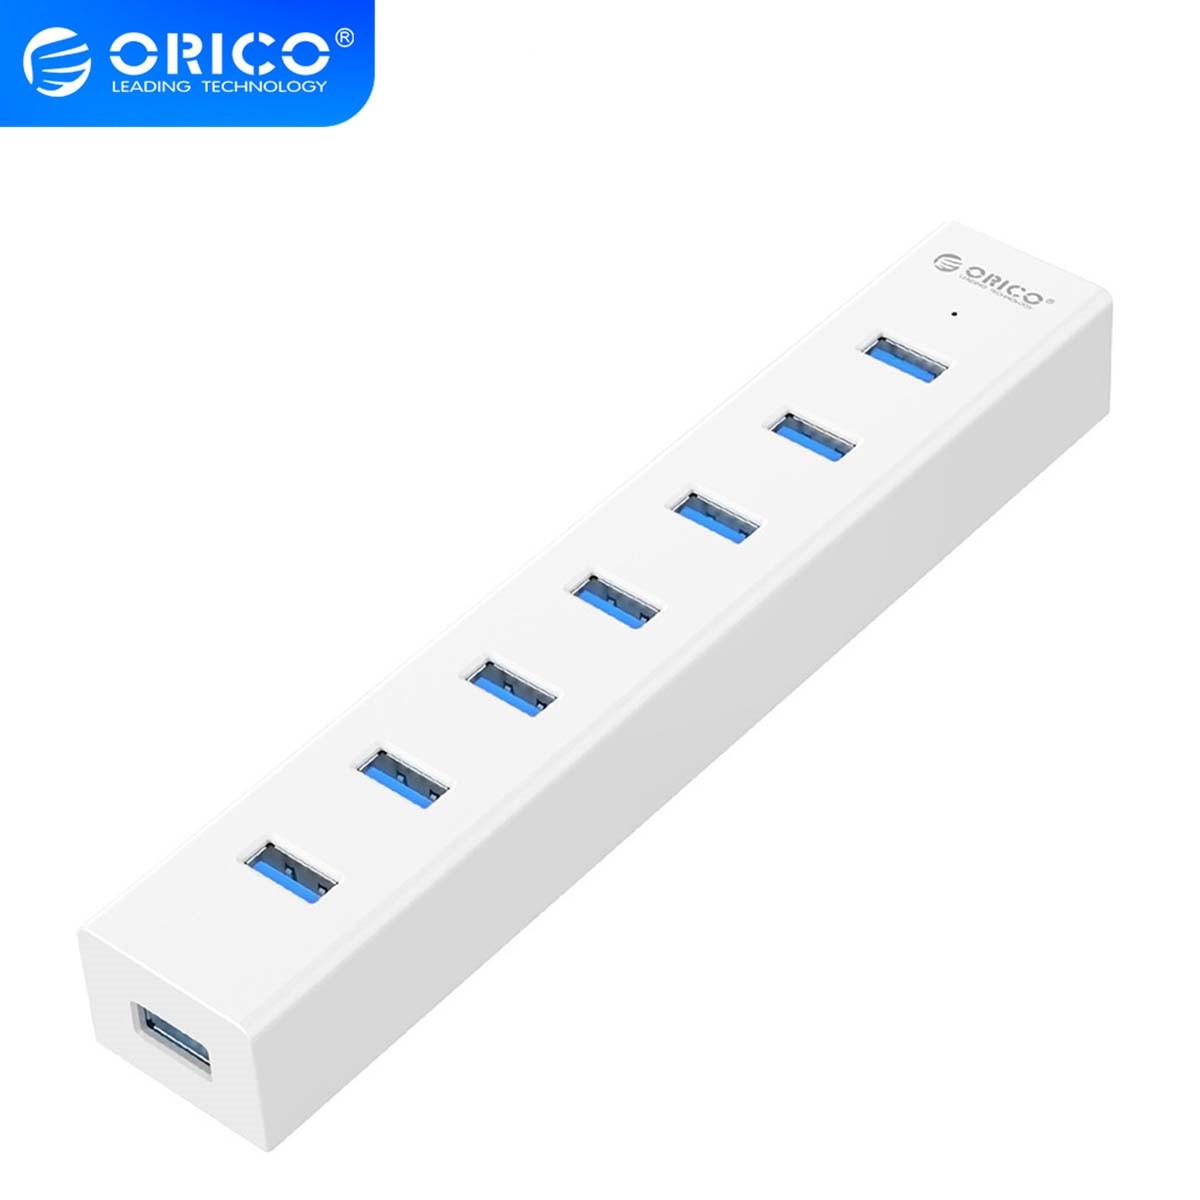 HUB USB ORICO USB3.0 HUB 7 Port za $8.49 / ~31zł